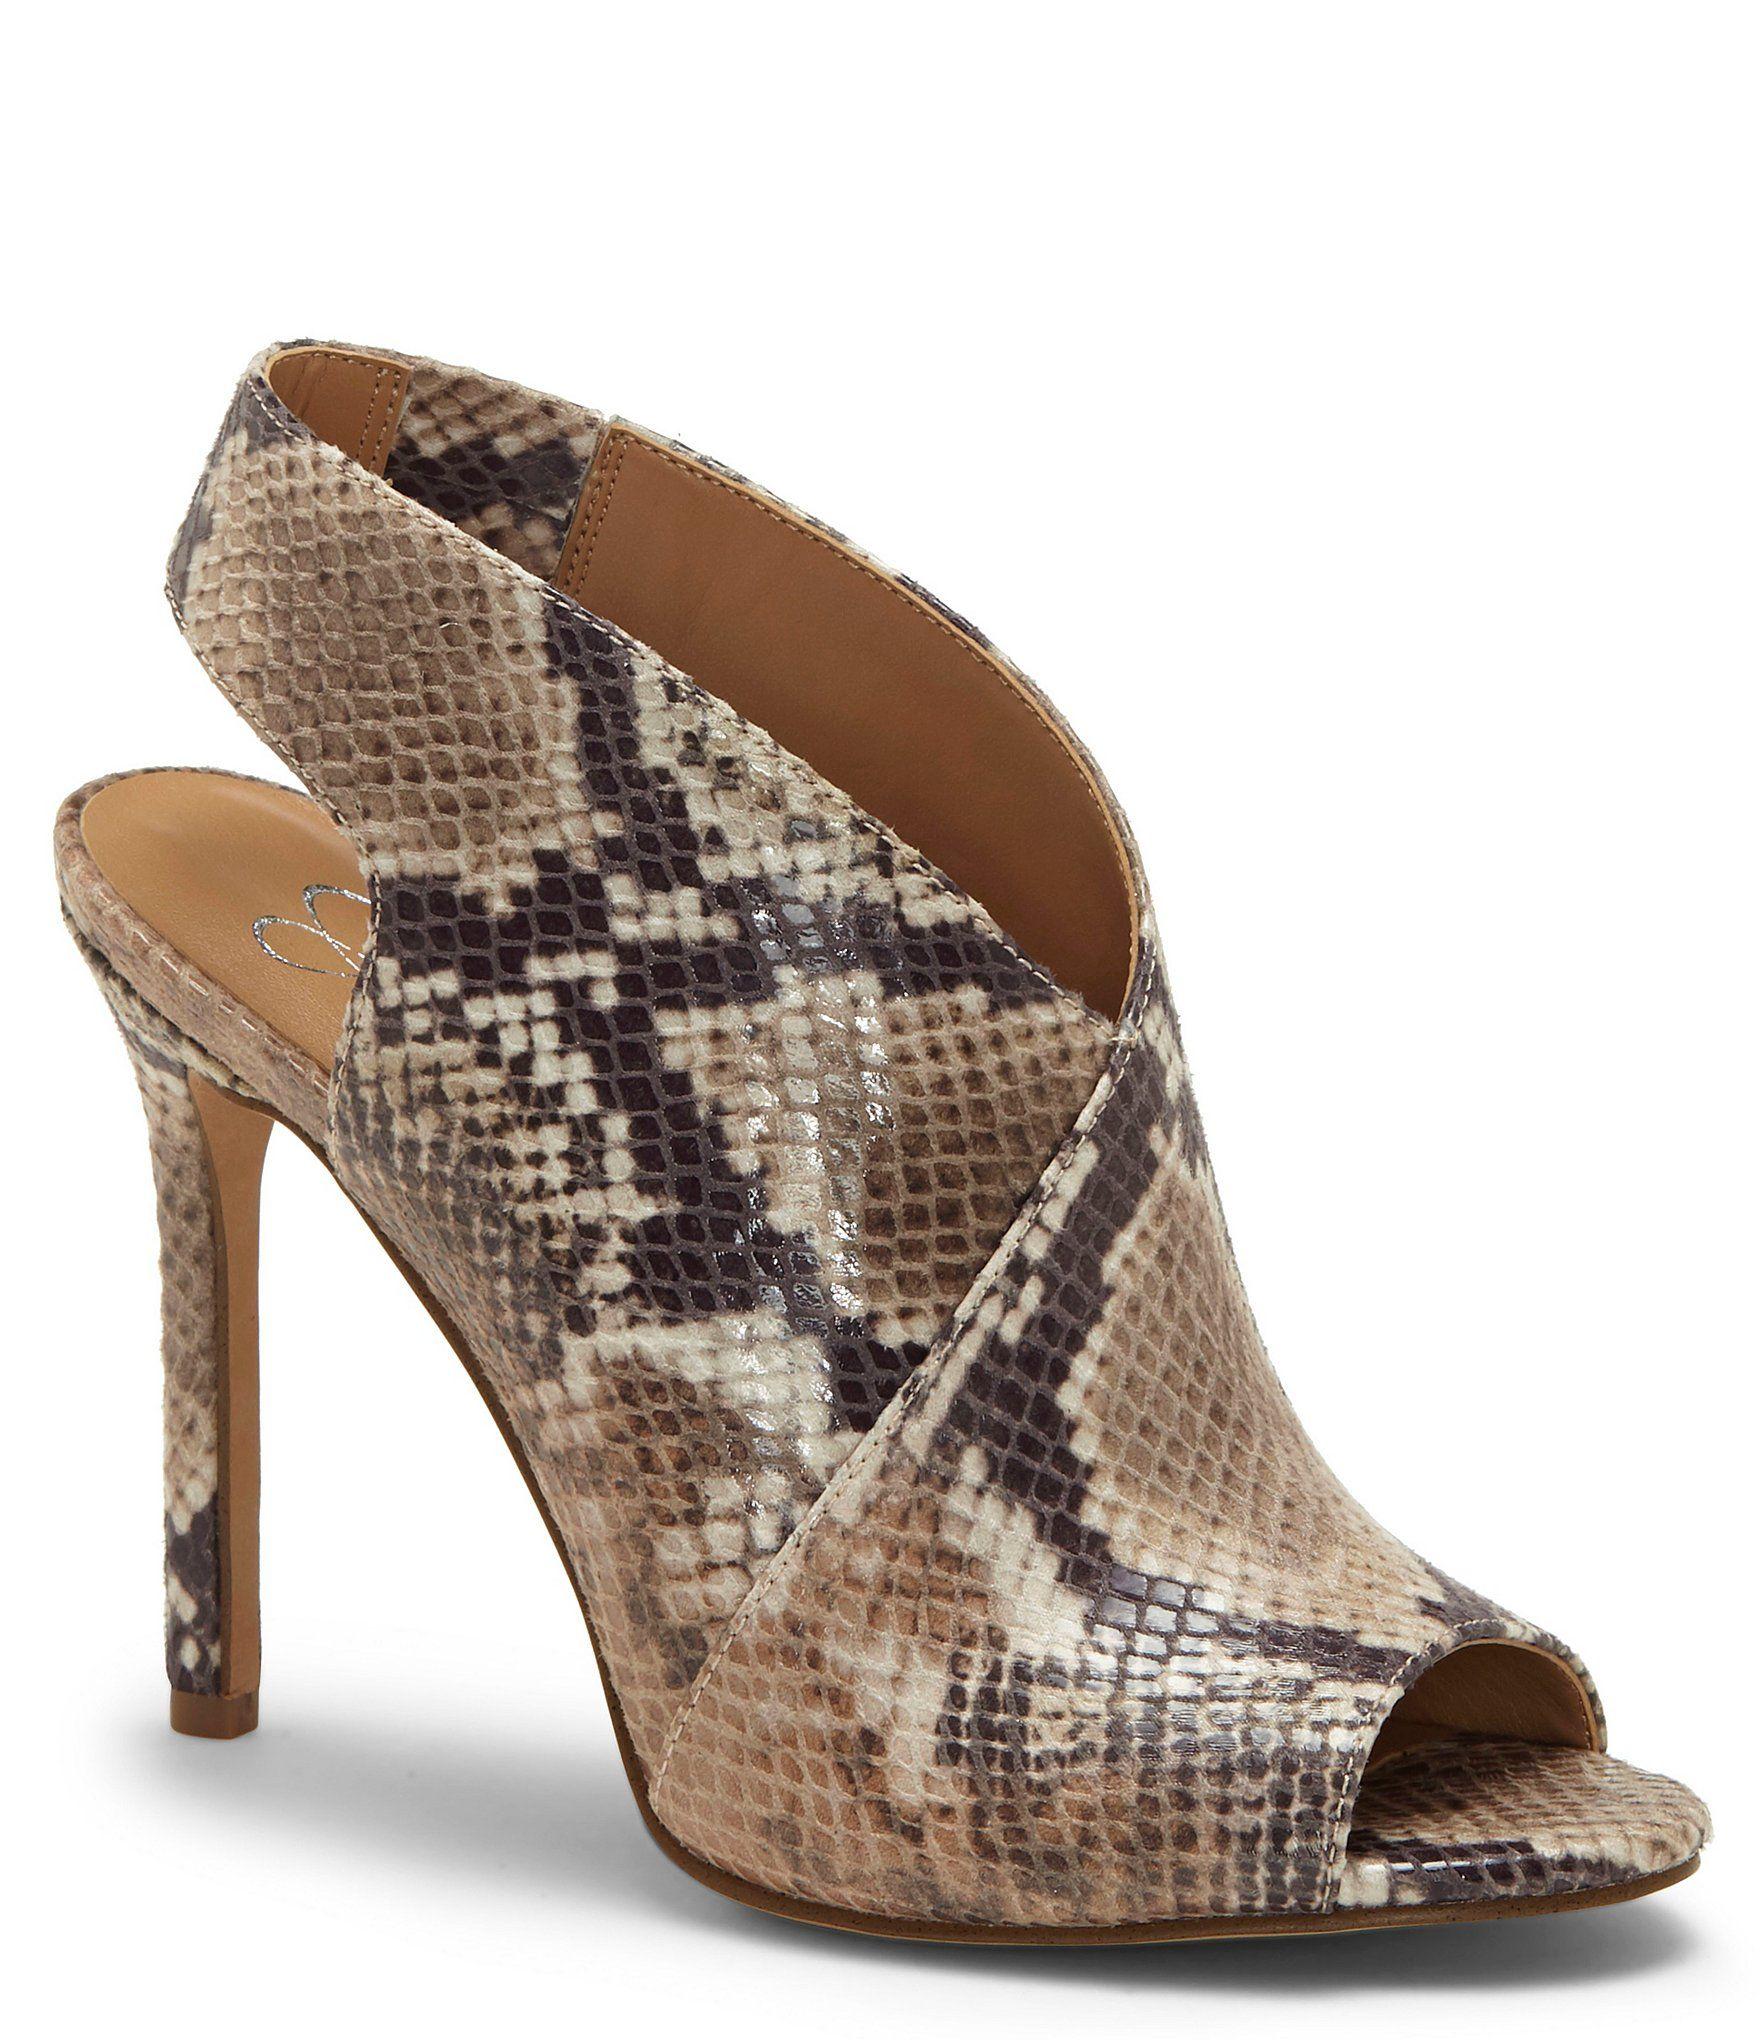 Jessica Simpson Jourie2 Snake Print Peep Toe Stiletto